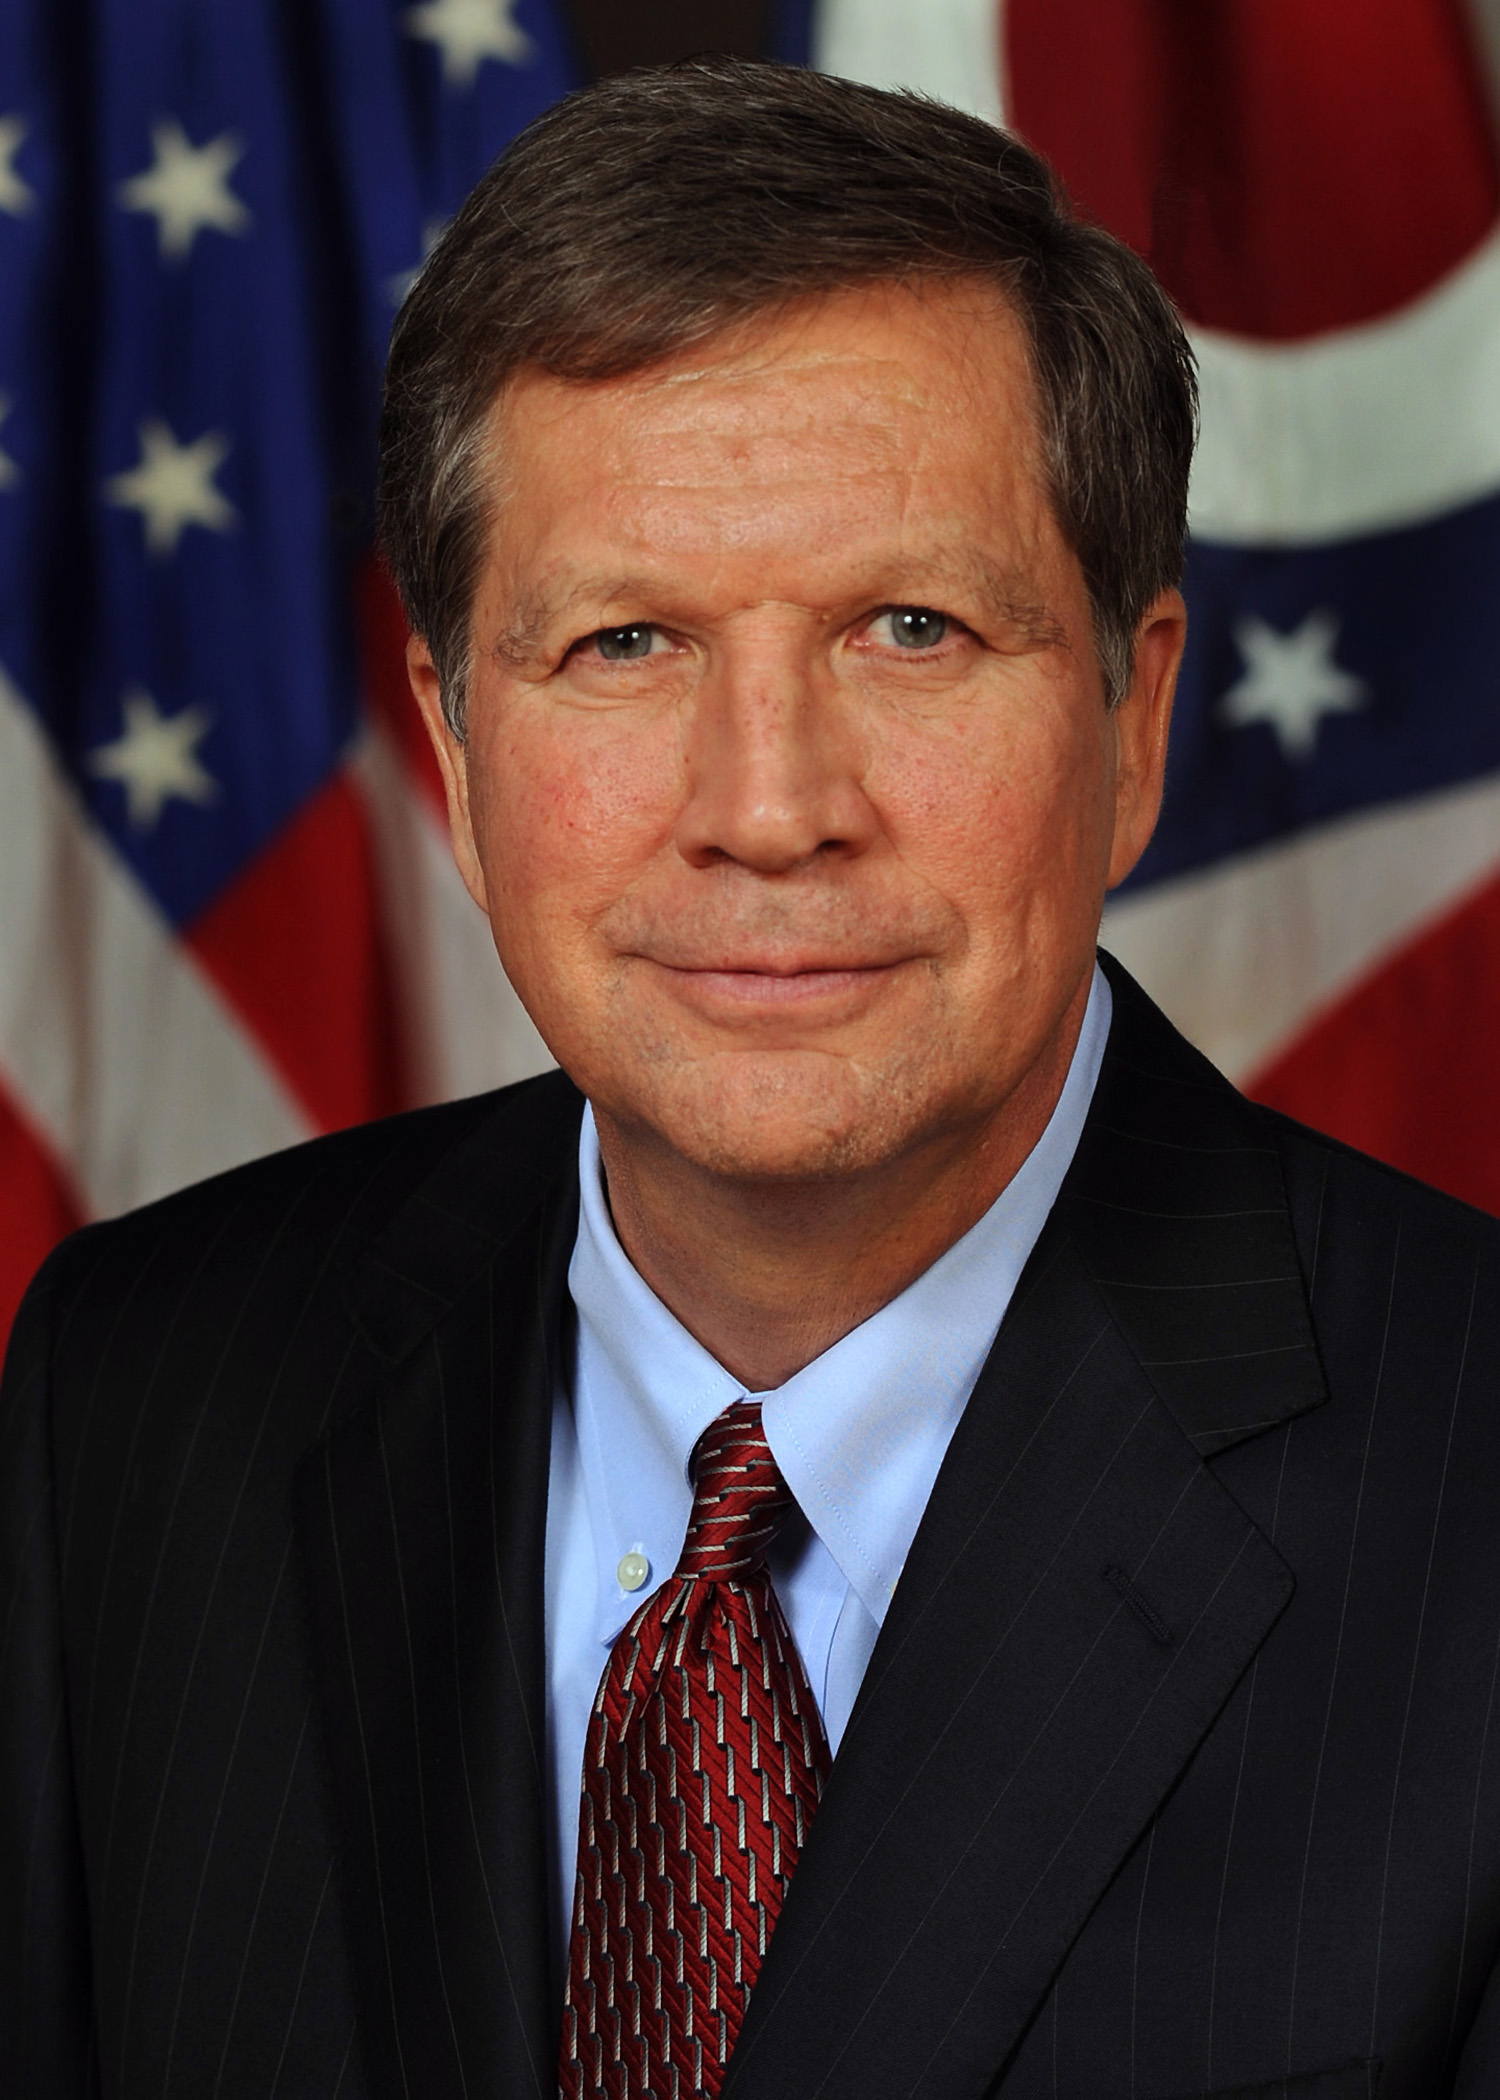 John Kasich, stock photo